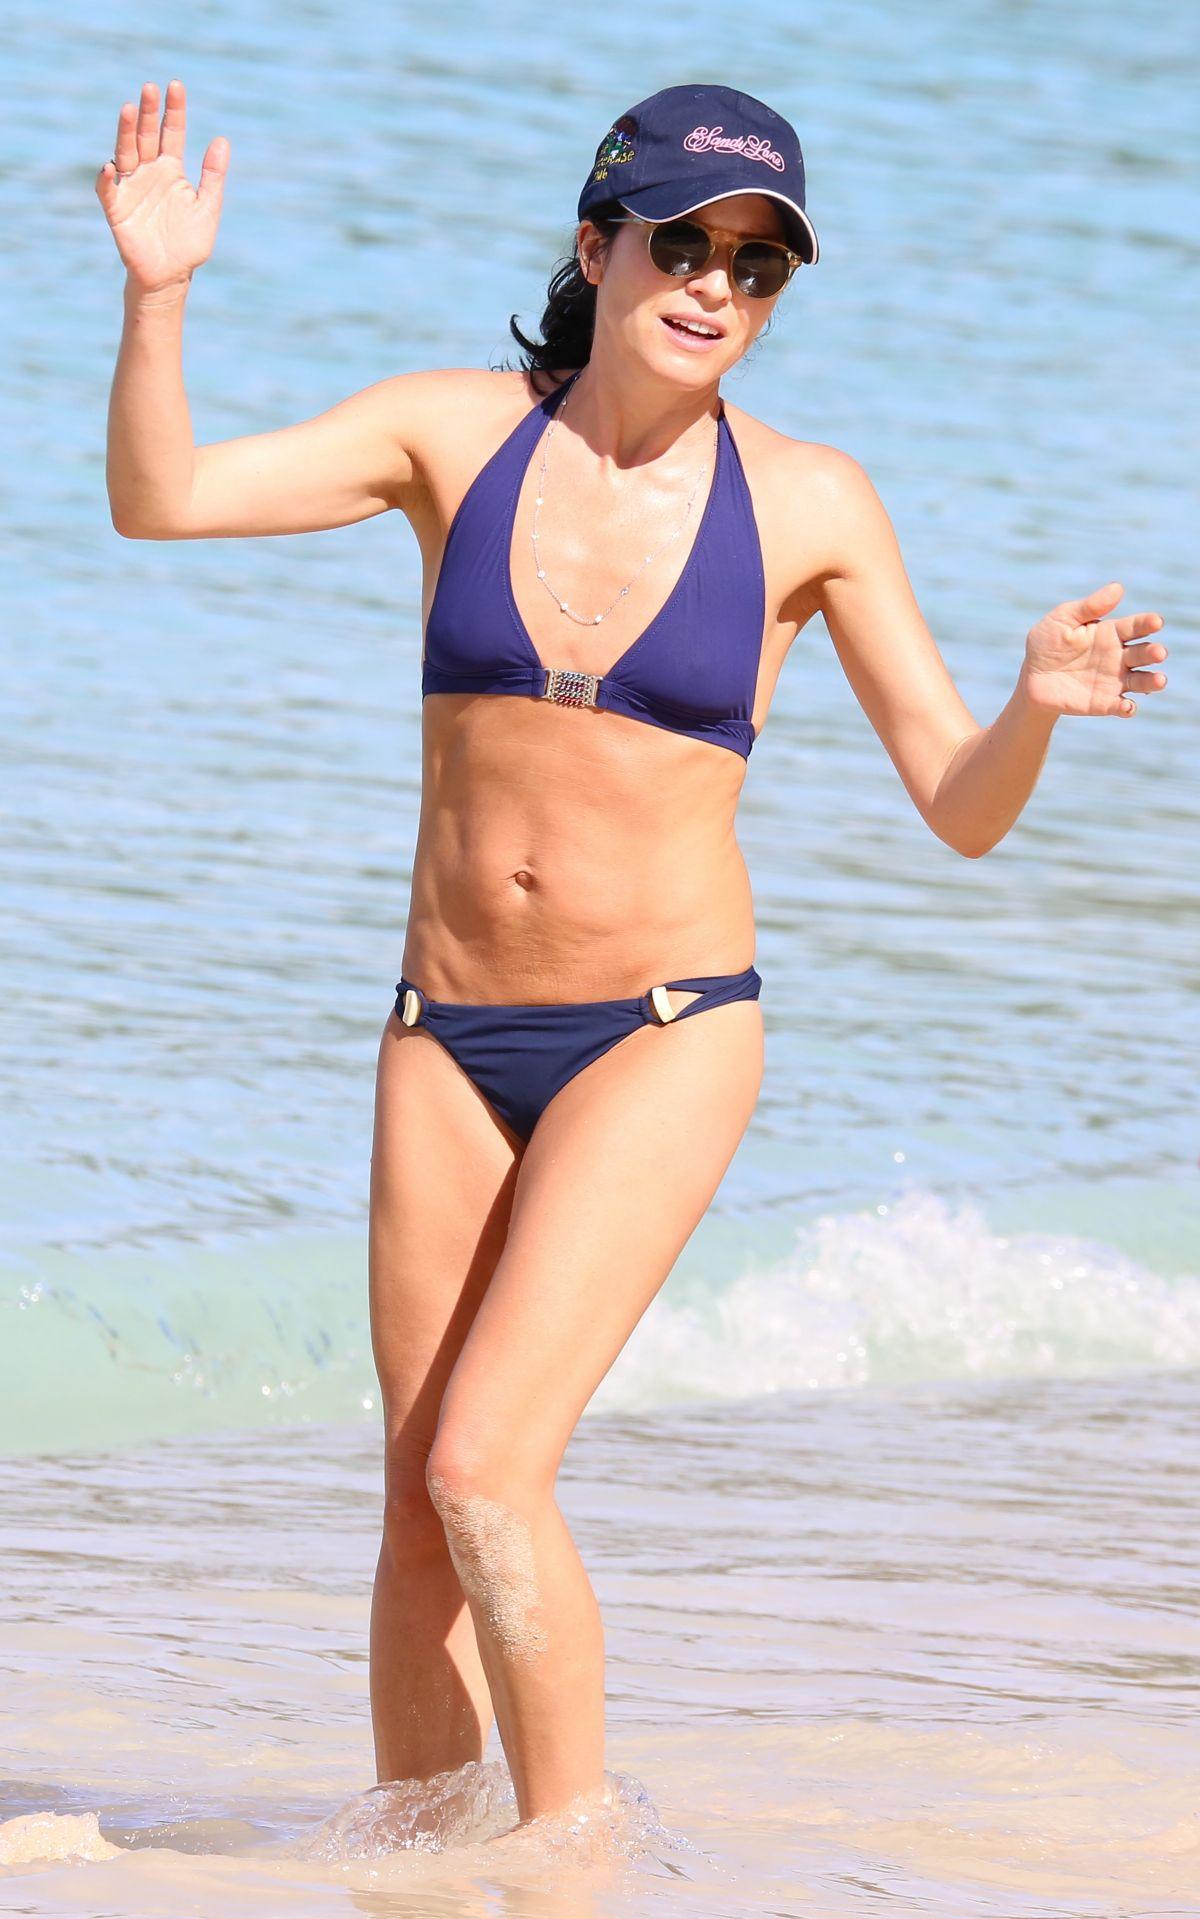 Andrea corr in bikini on the beach in barbados 02152018 hawtcelebs andrea corr in bikini on the beach in barbados 02152018 altavistaventures Images